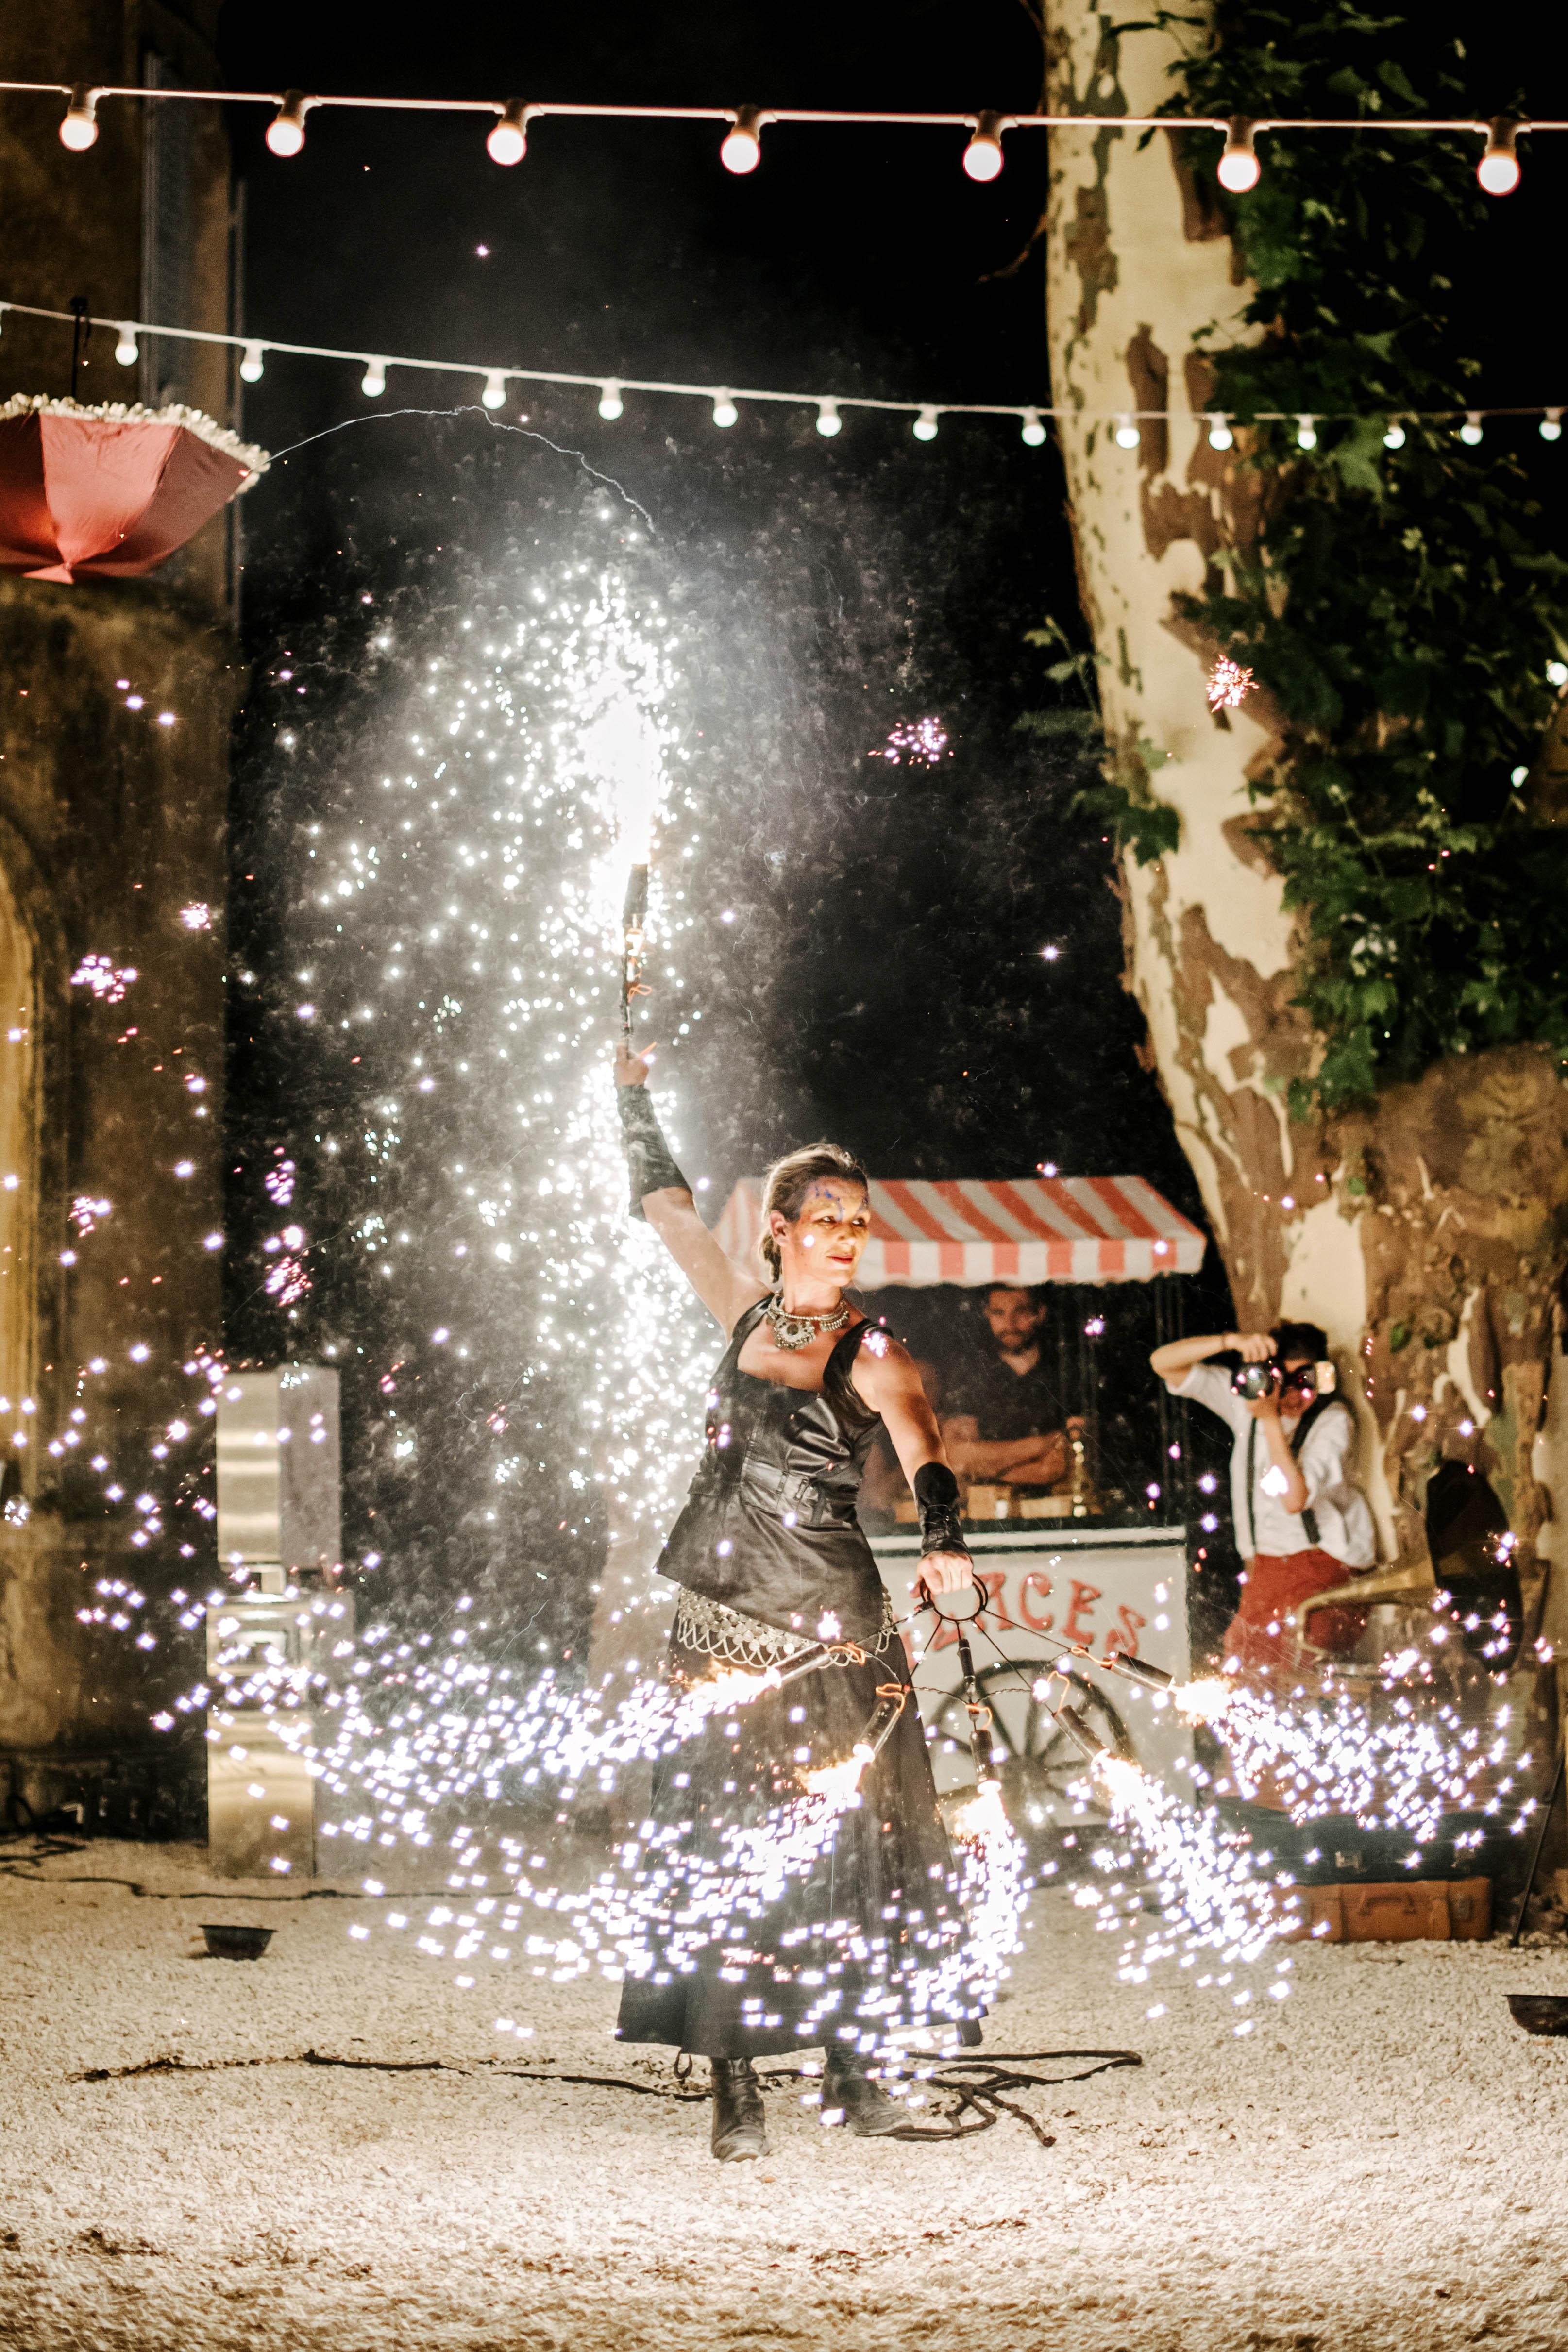 lara kjell circus party sparklers performer